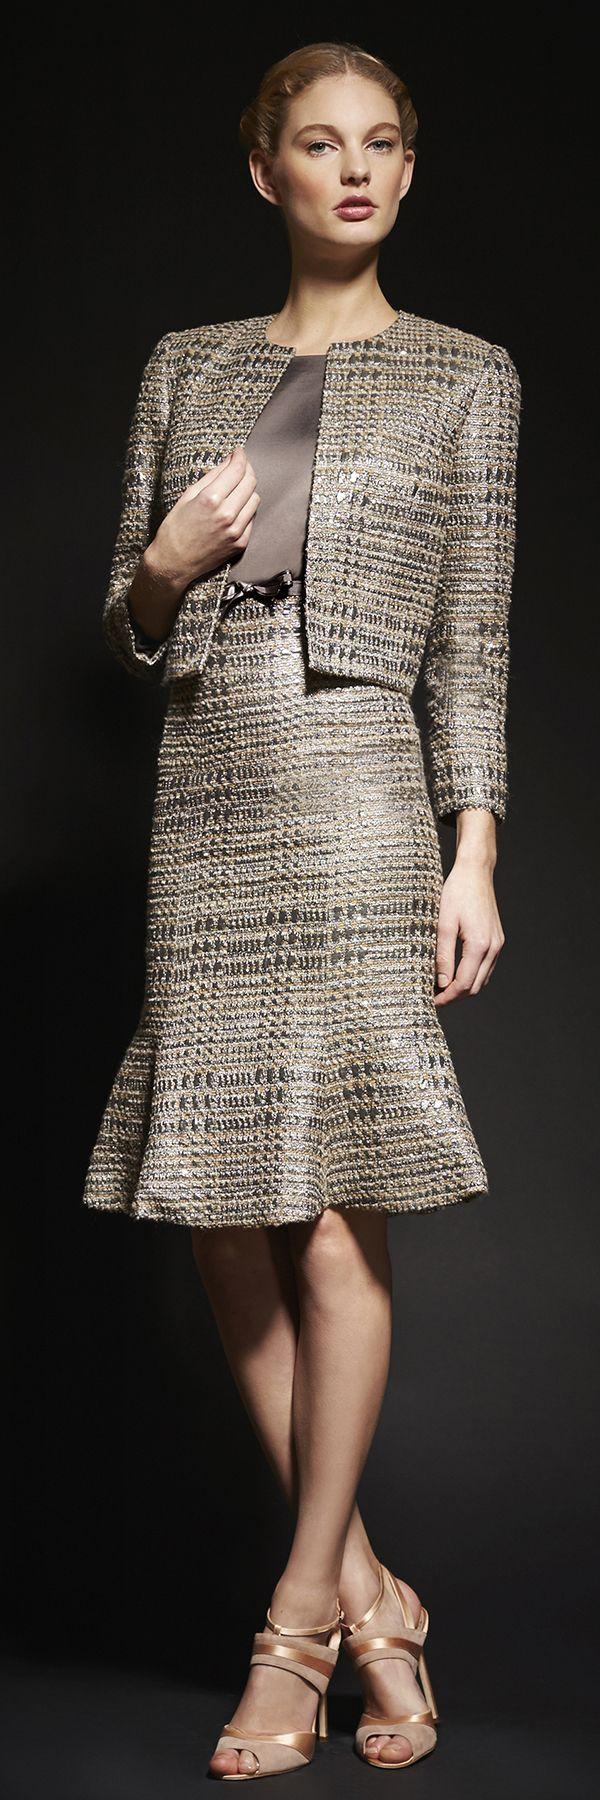 Carolina Herrera Fall 2013 Ready To Wear Collection